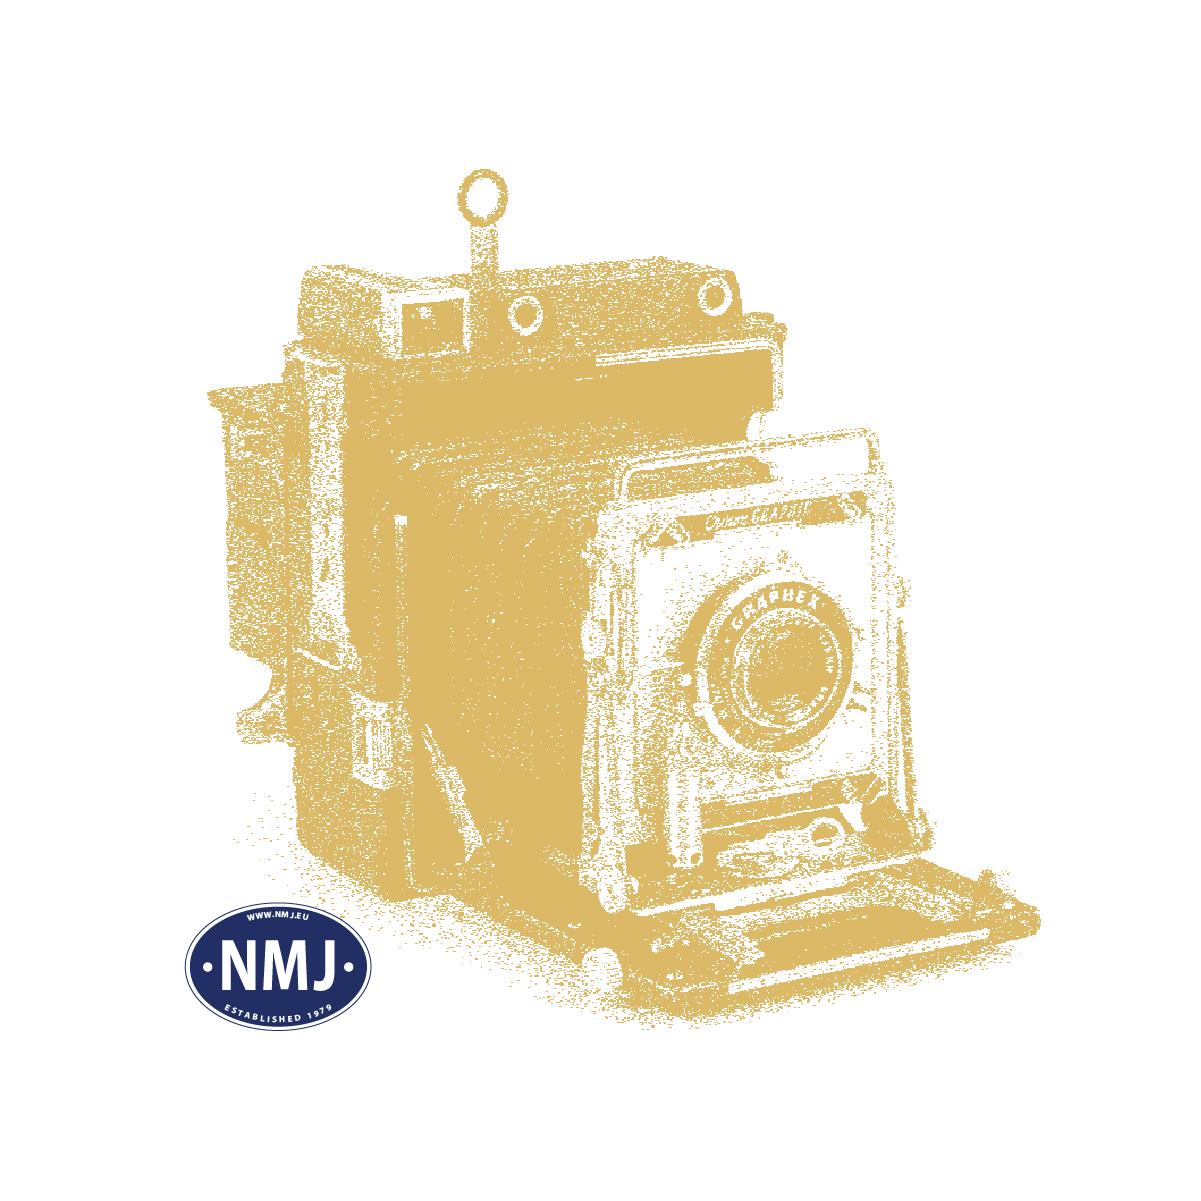 "NMJT136.302 - NMJ Topline NSB CB2 21227 ""Intercity Spesial"", 1987-2002"